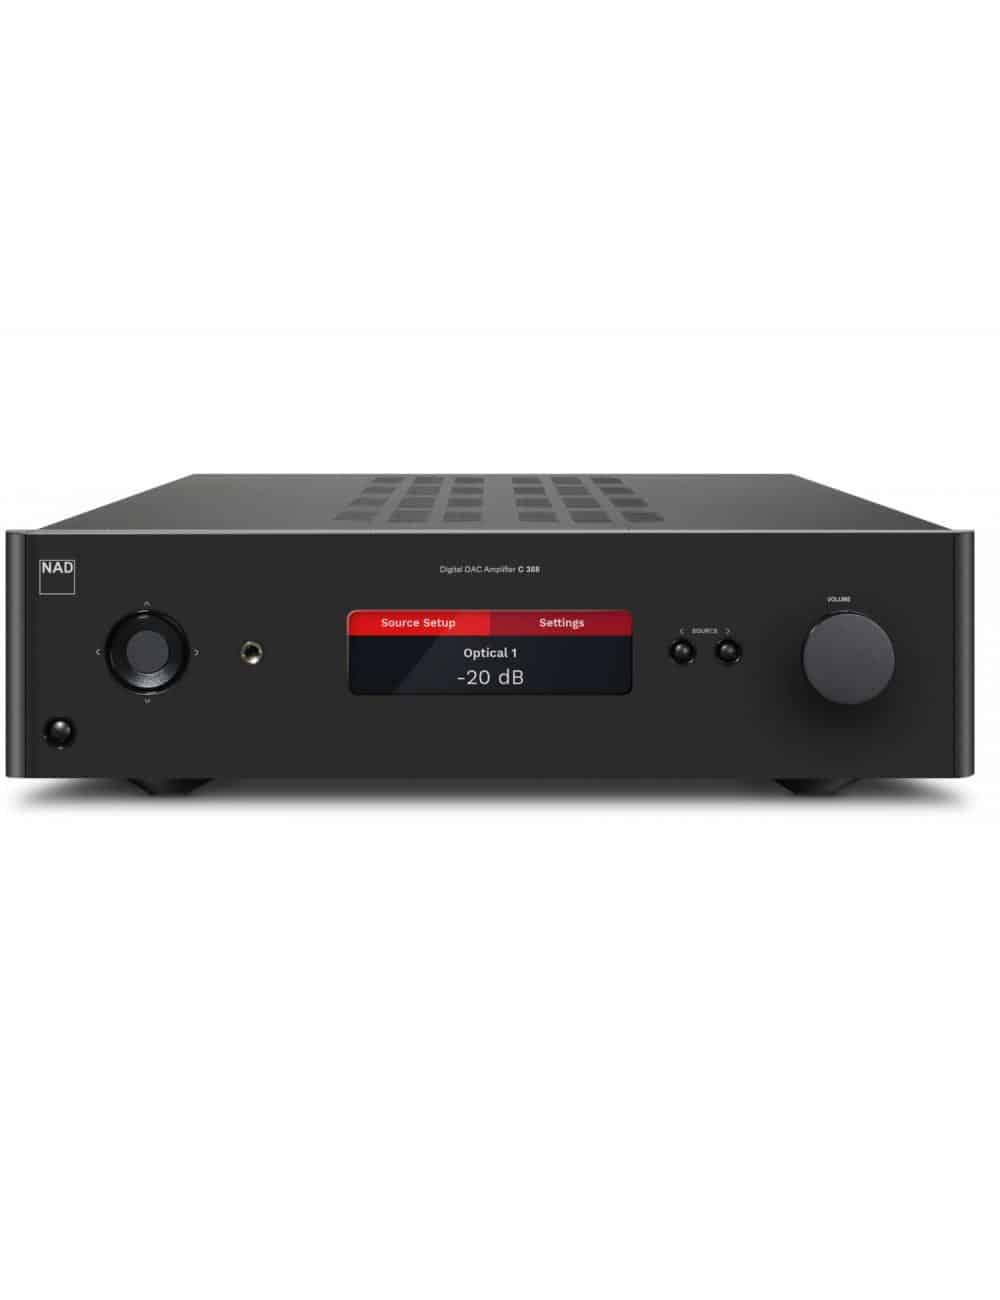 amplificatore HiFi, NAD C 388 Hybrid Digital DAC Amplifier, vista frontale